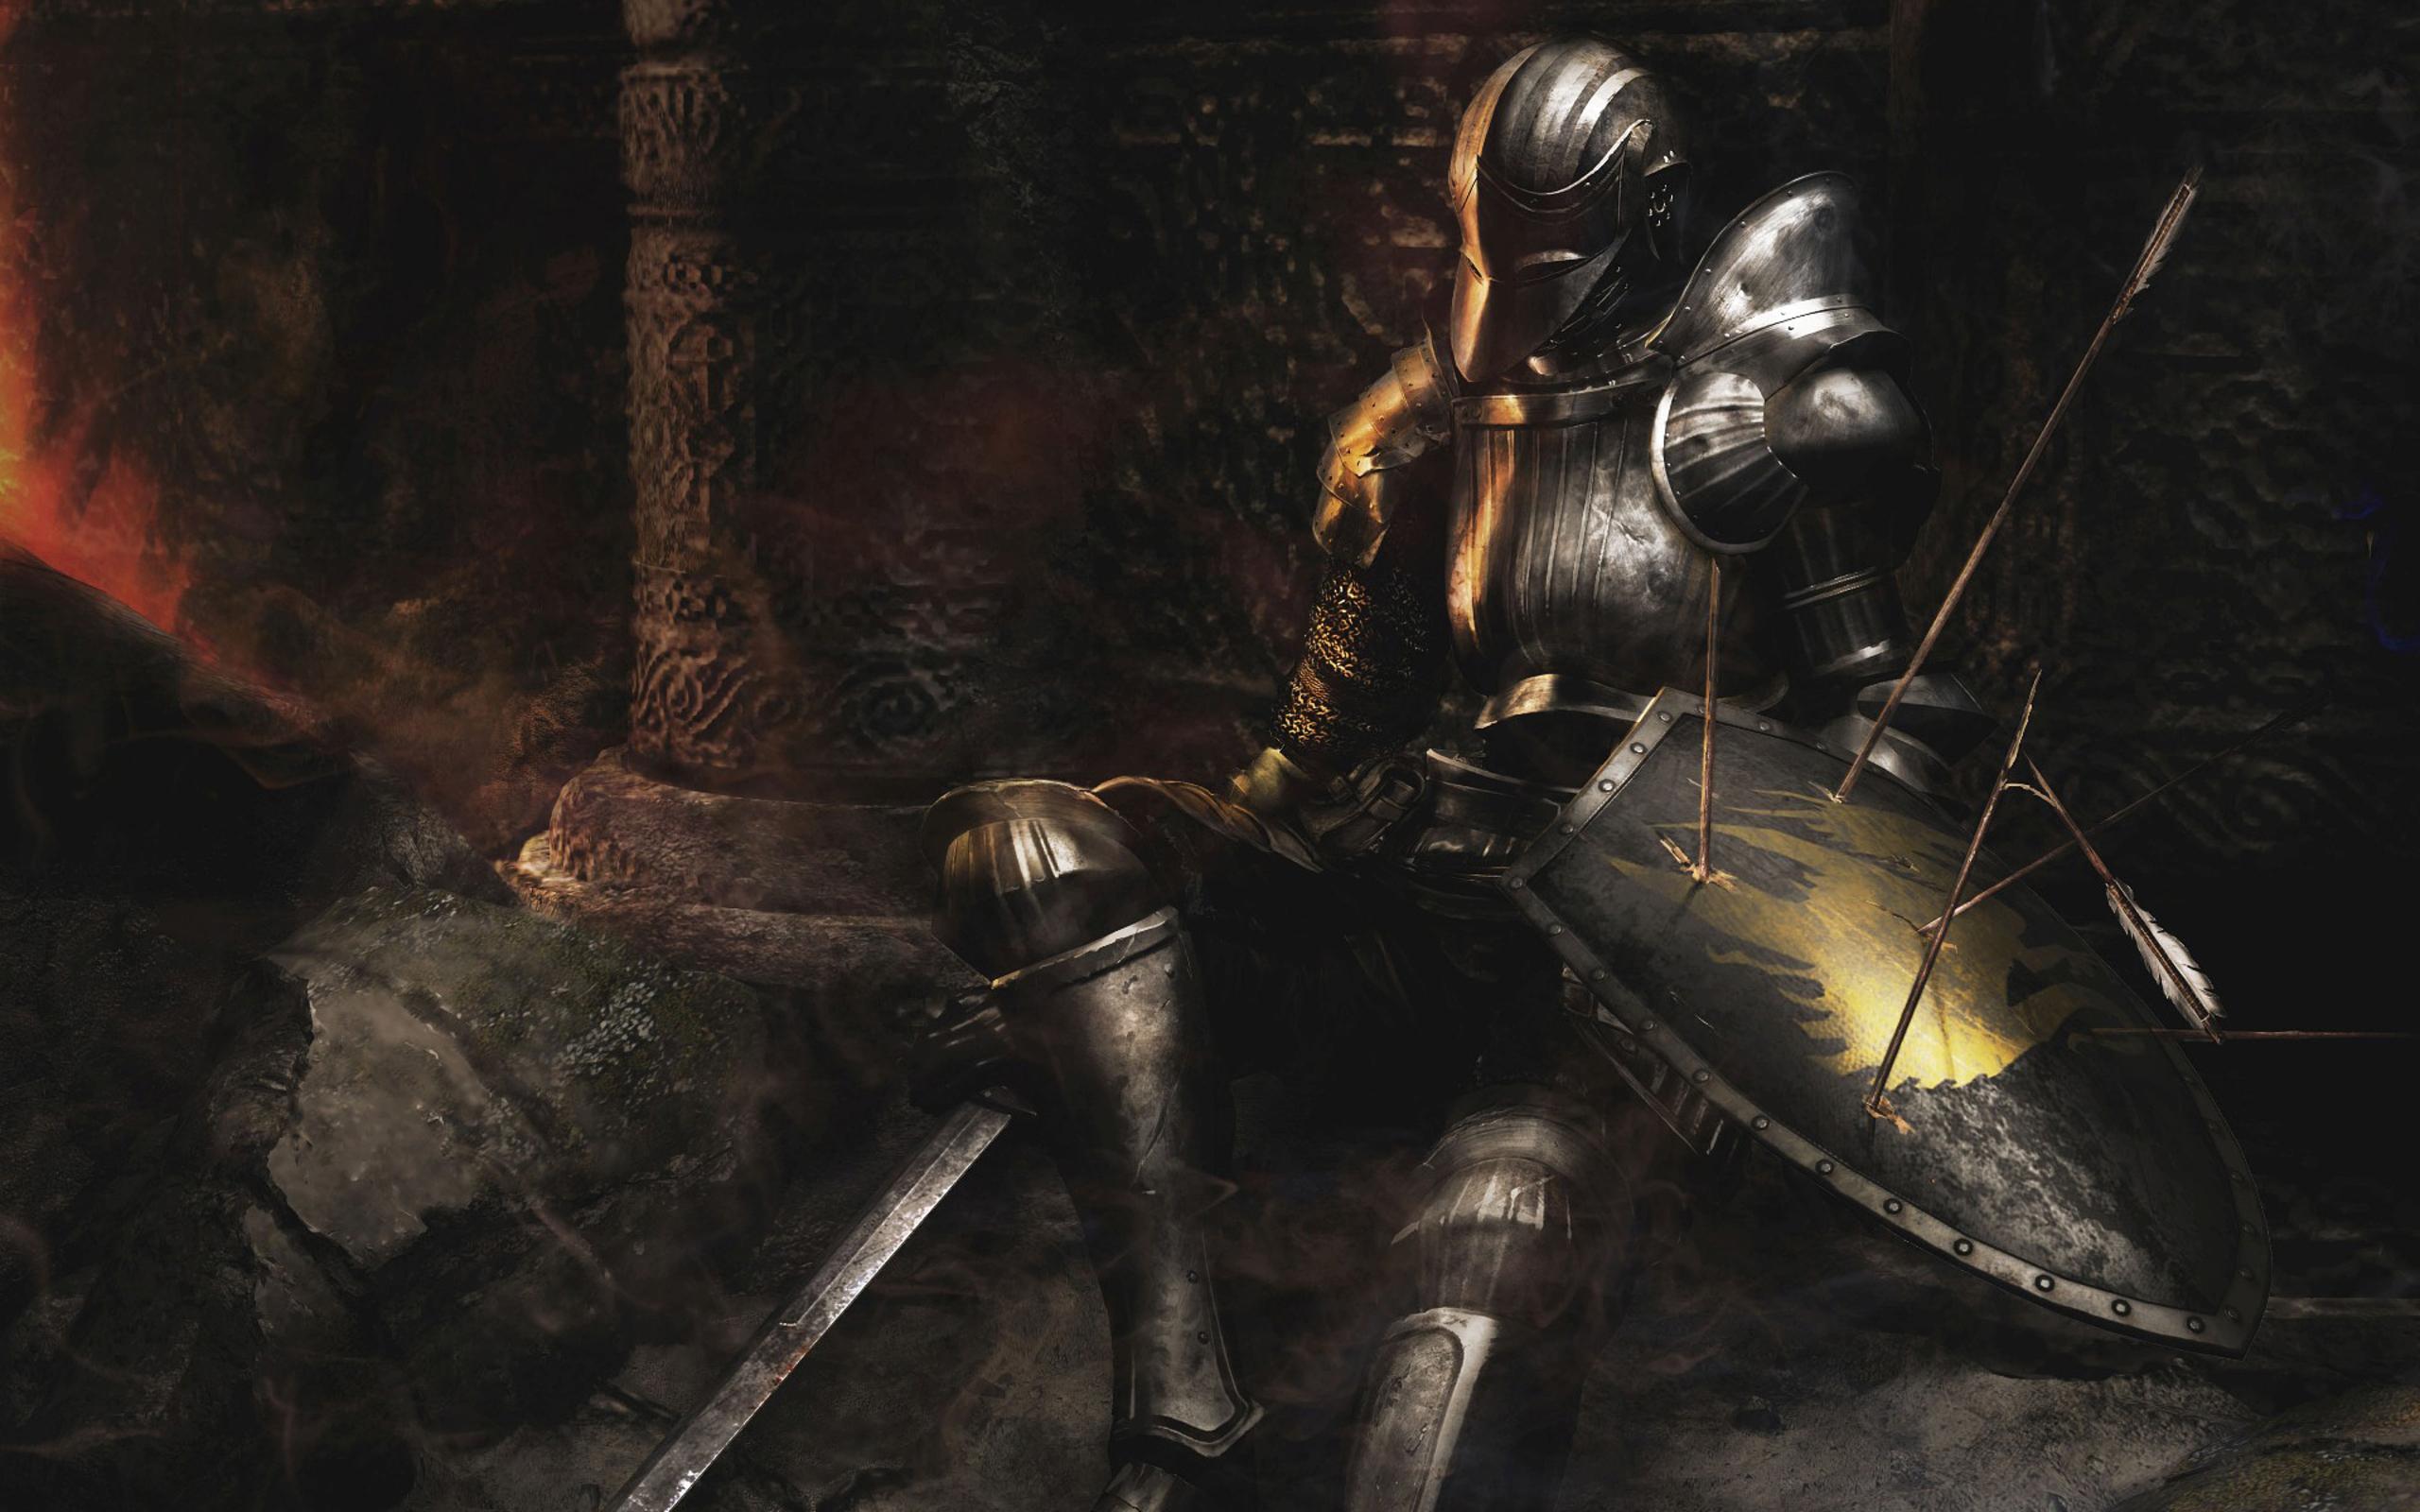 Dark Souls Wallpapers, Dark Souls Image Galleries, 43  | GuoGuiyan ...